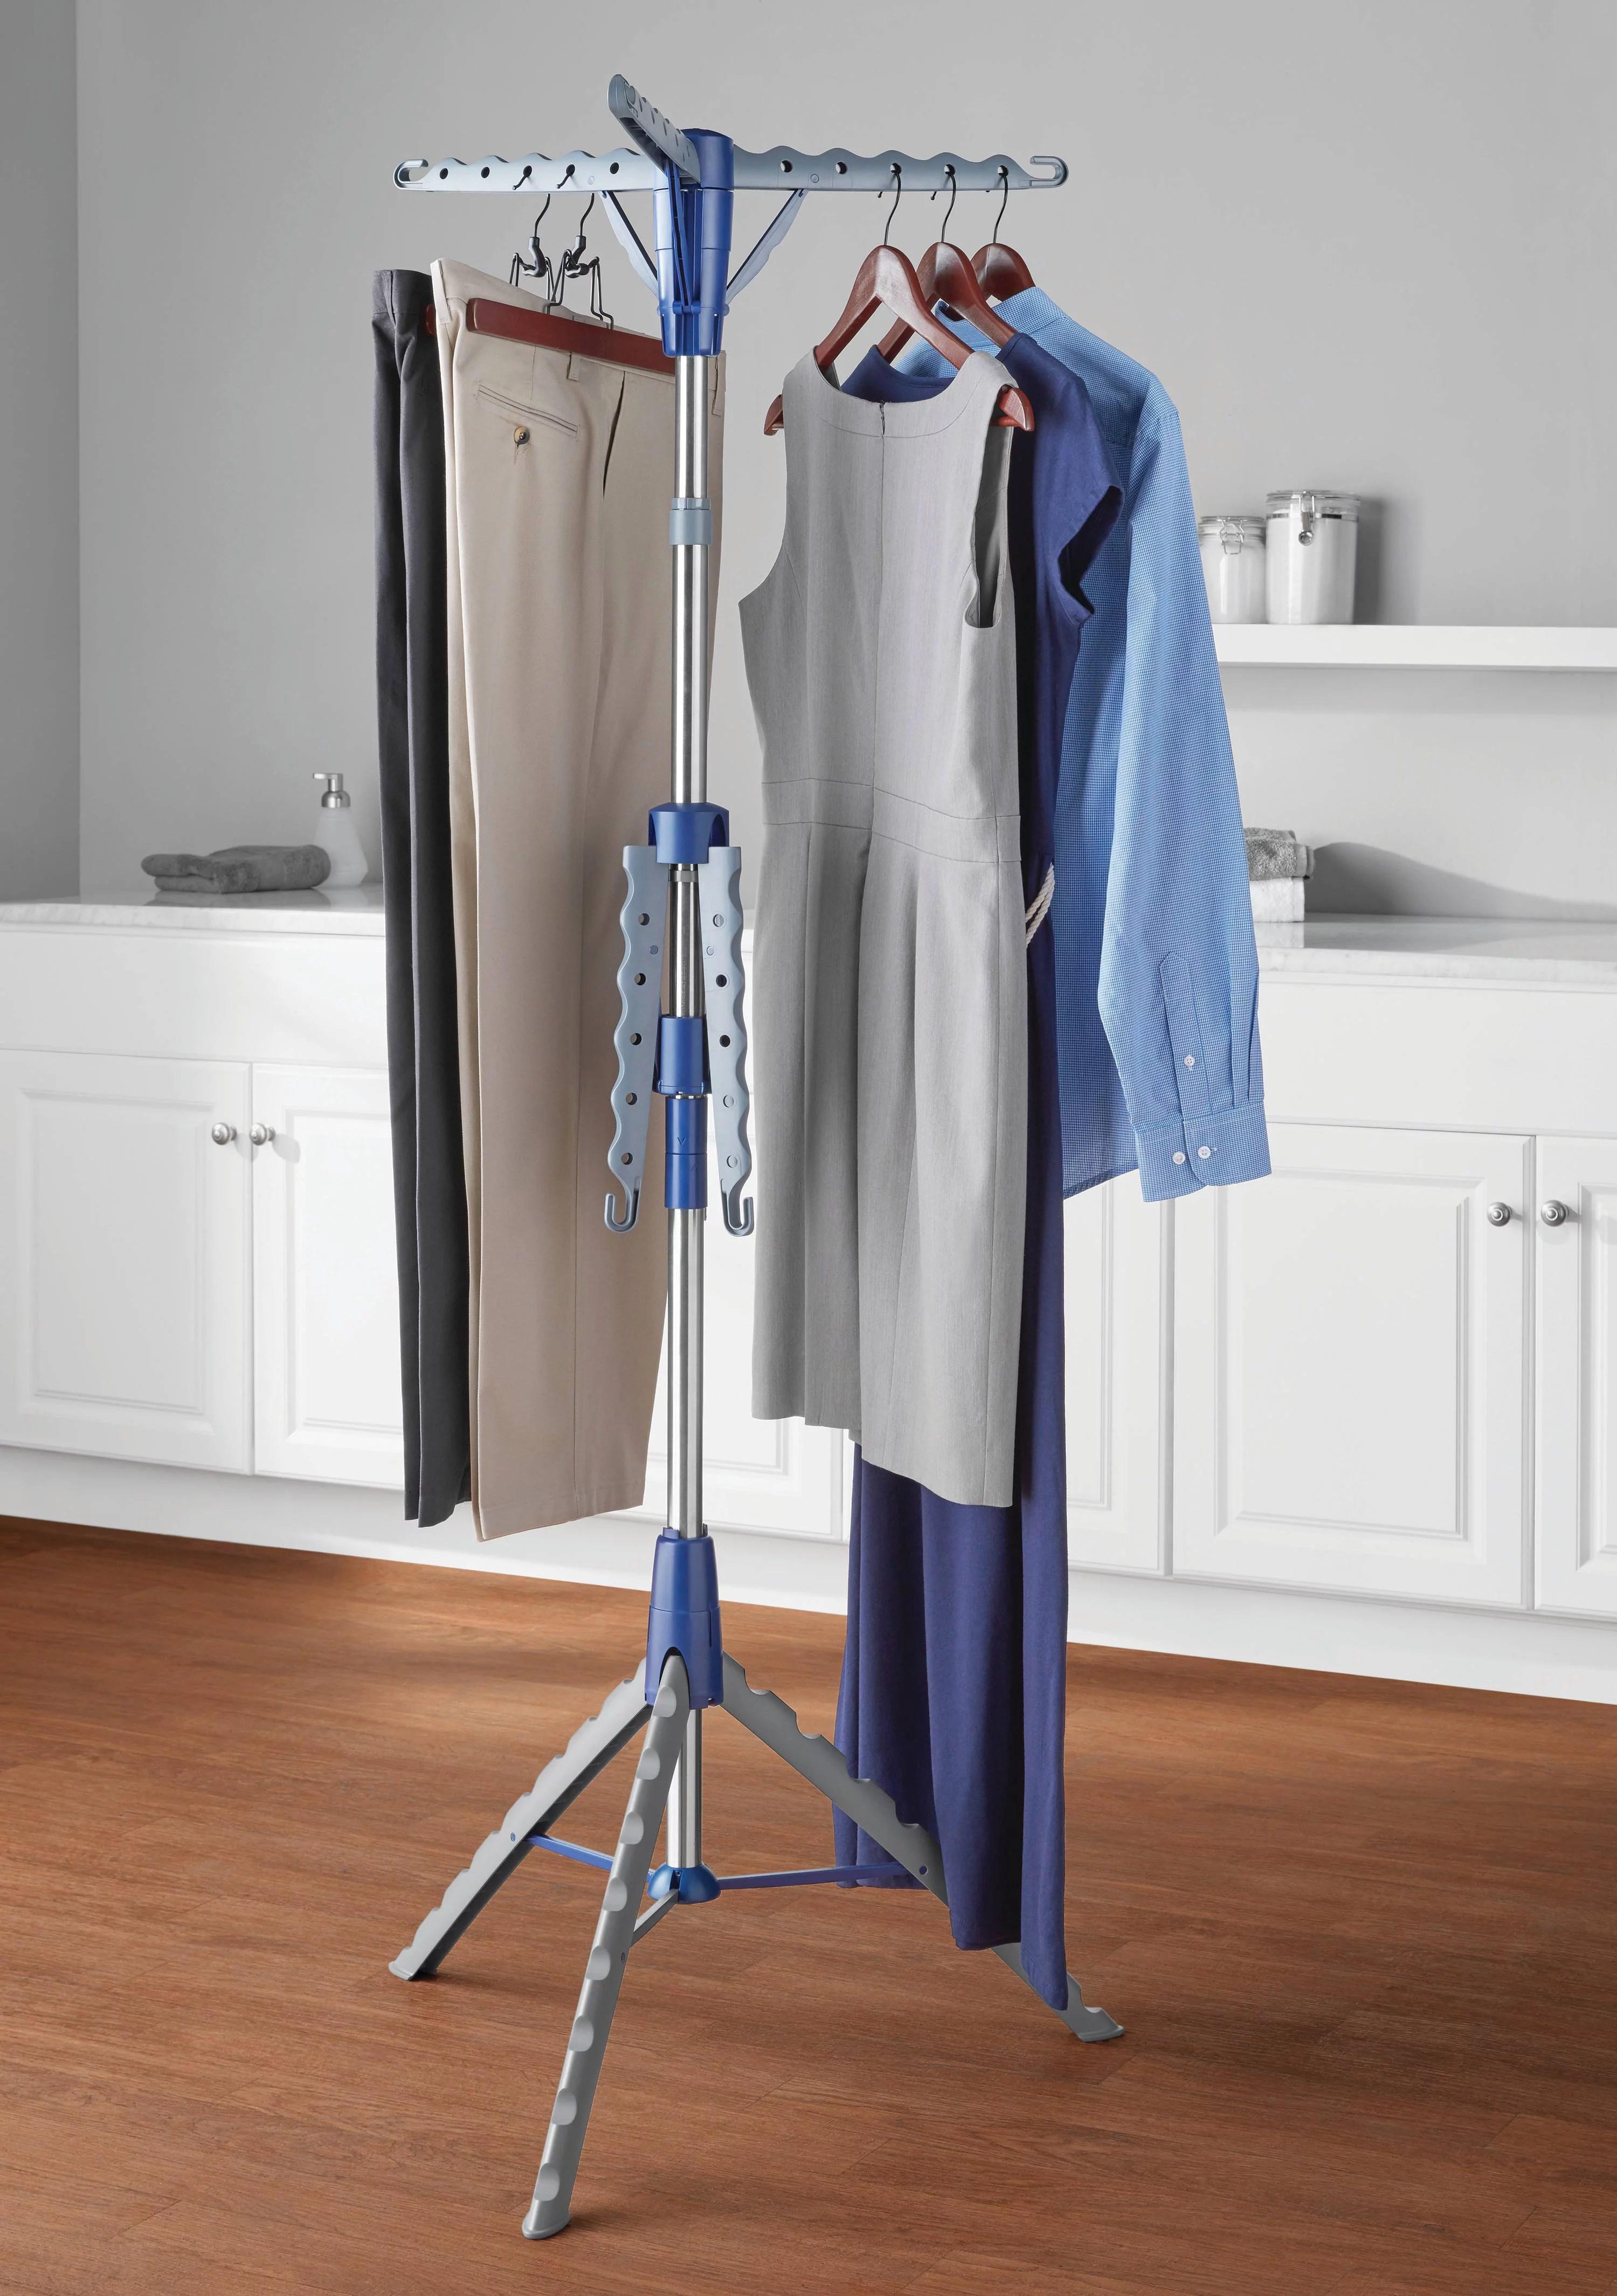 mainstays space saving 2 tier tripod hanging clothes drying rack walmart com